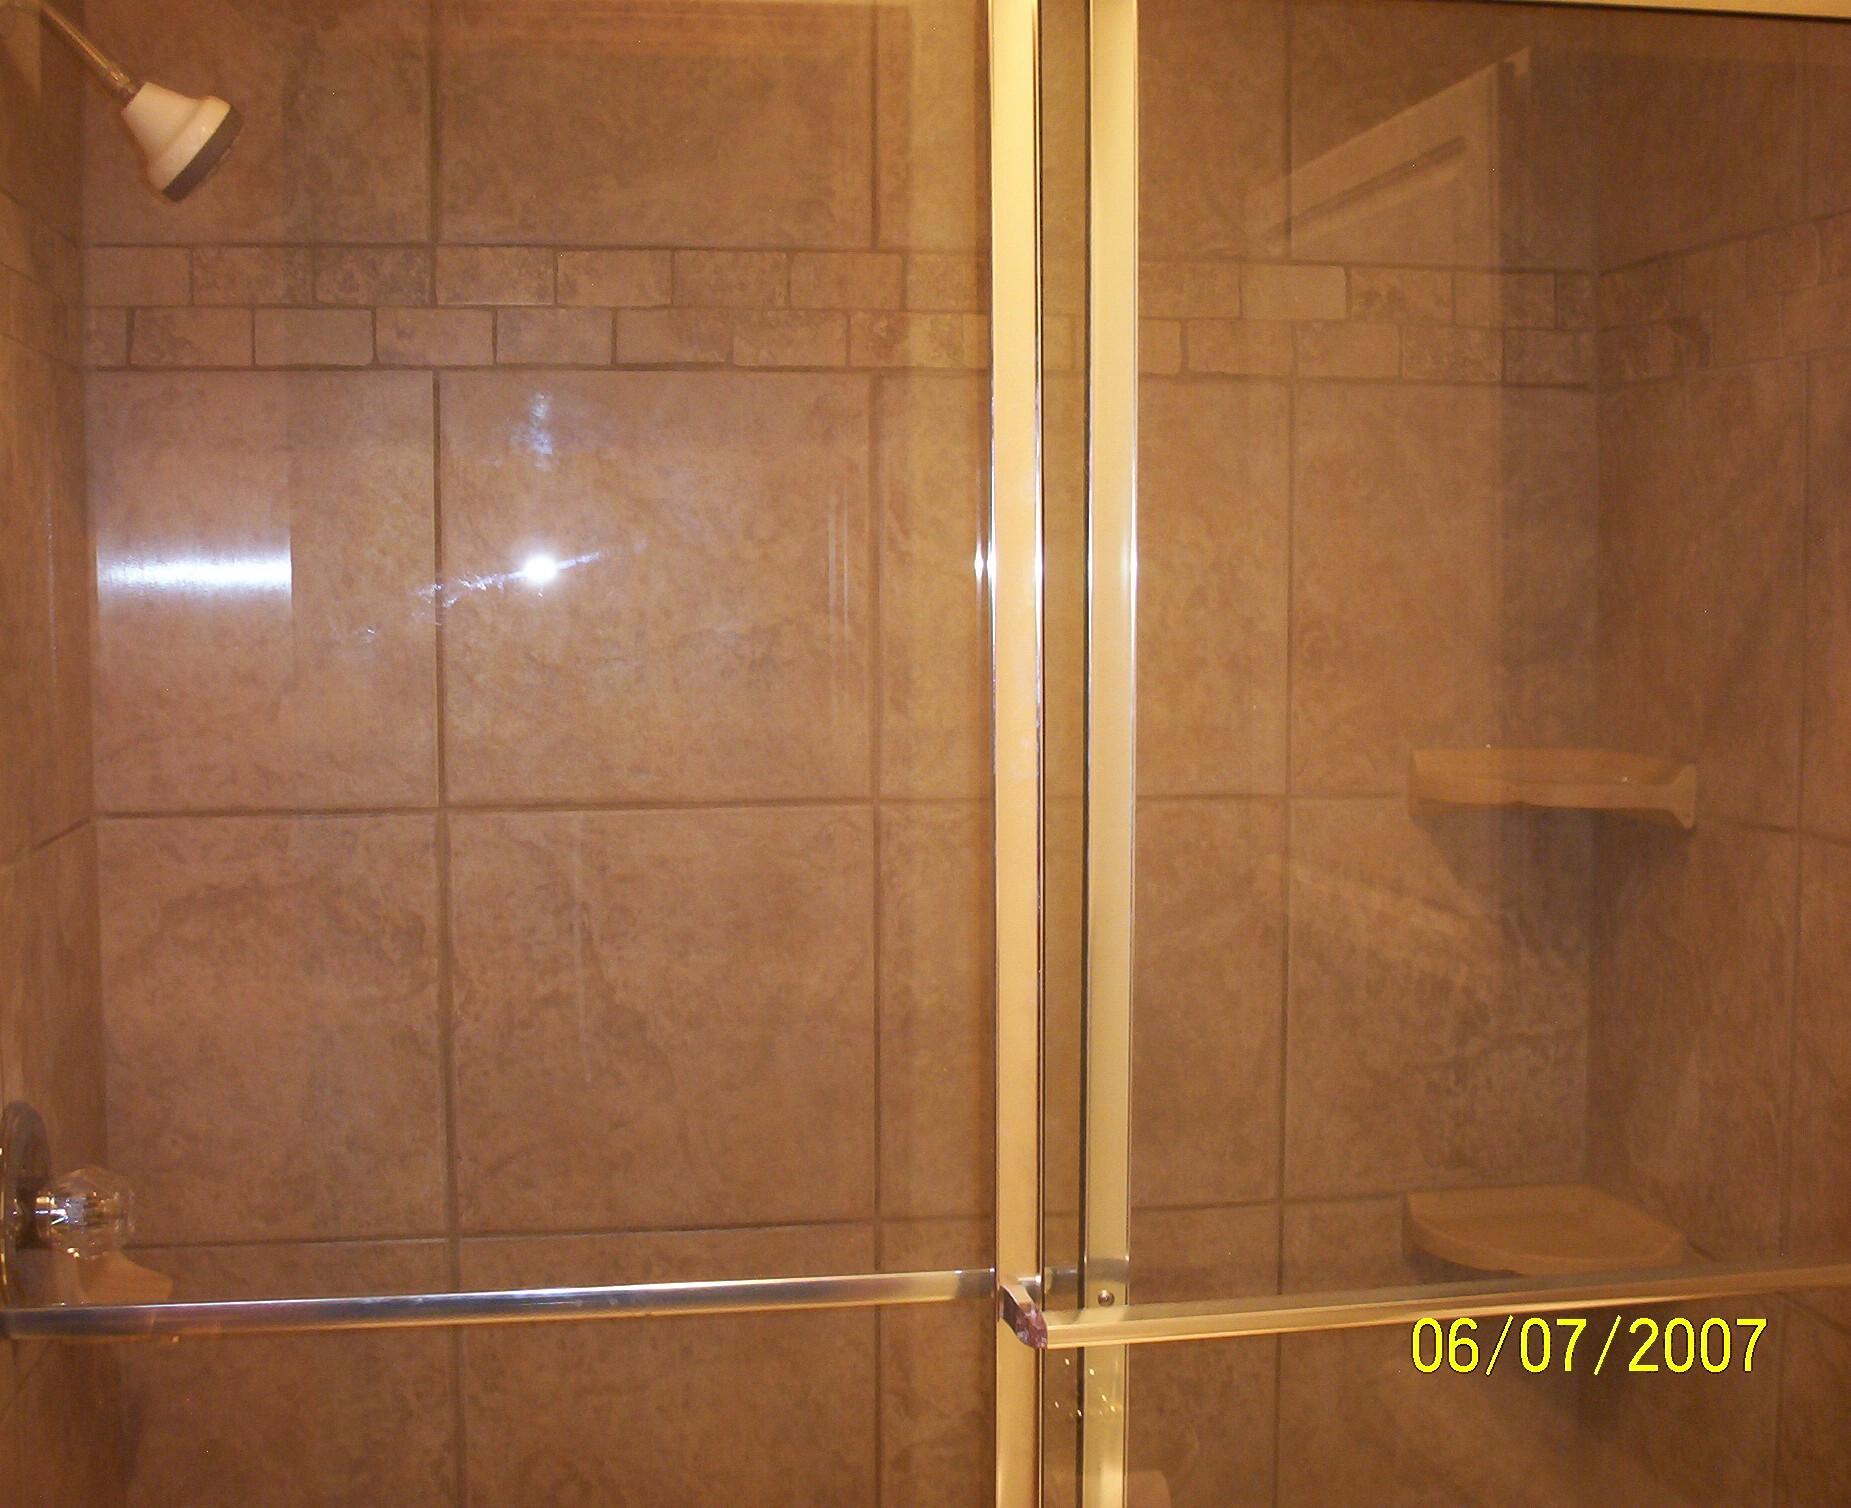 Combathroom Baths And Showers : Fiberglass Tub Shower Door with Glass